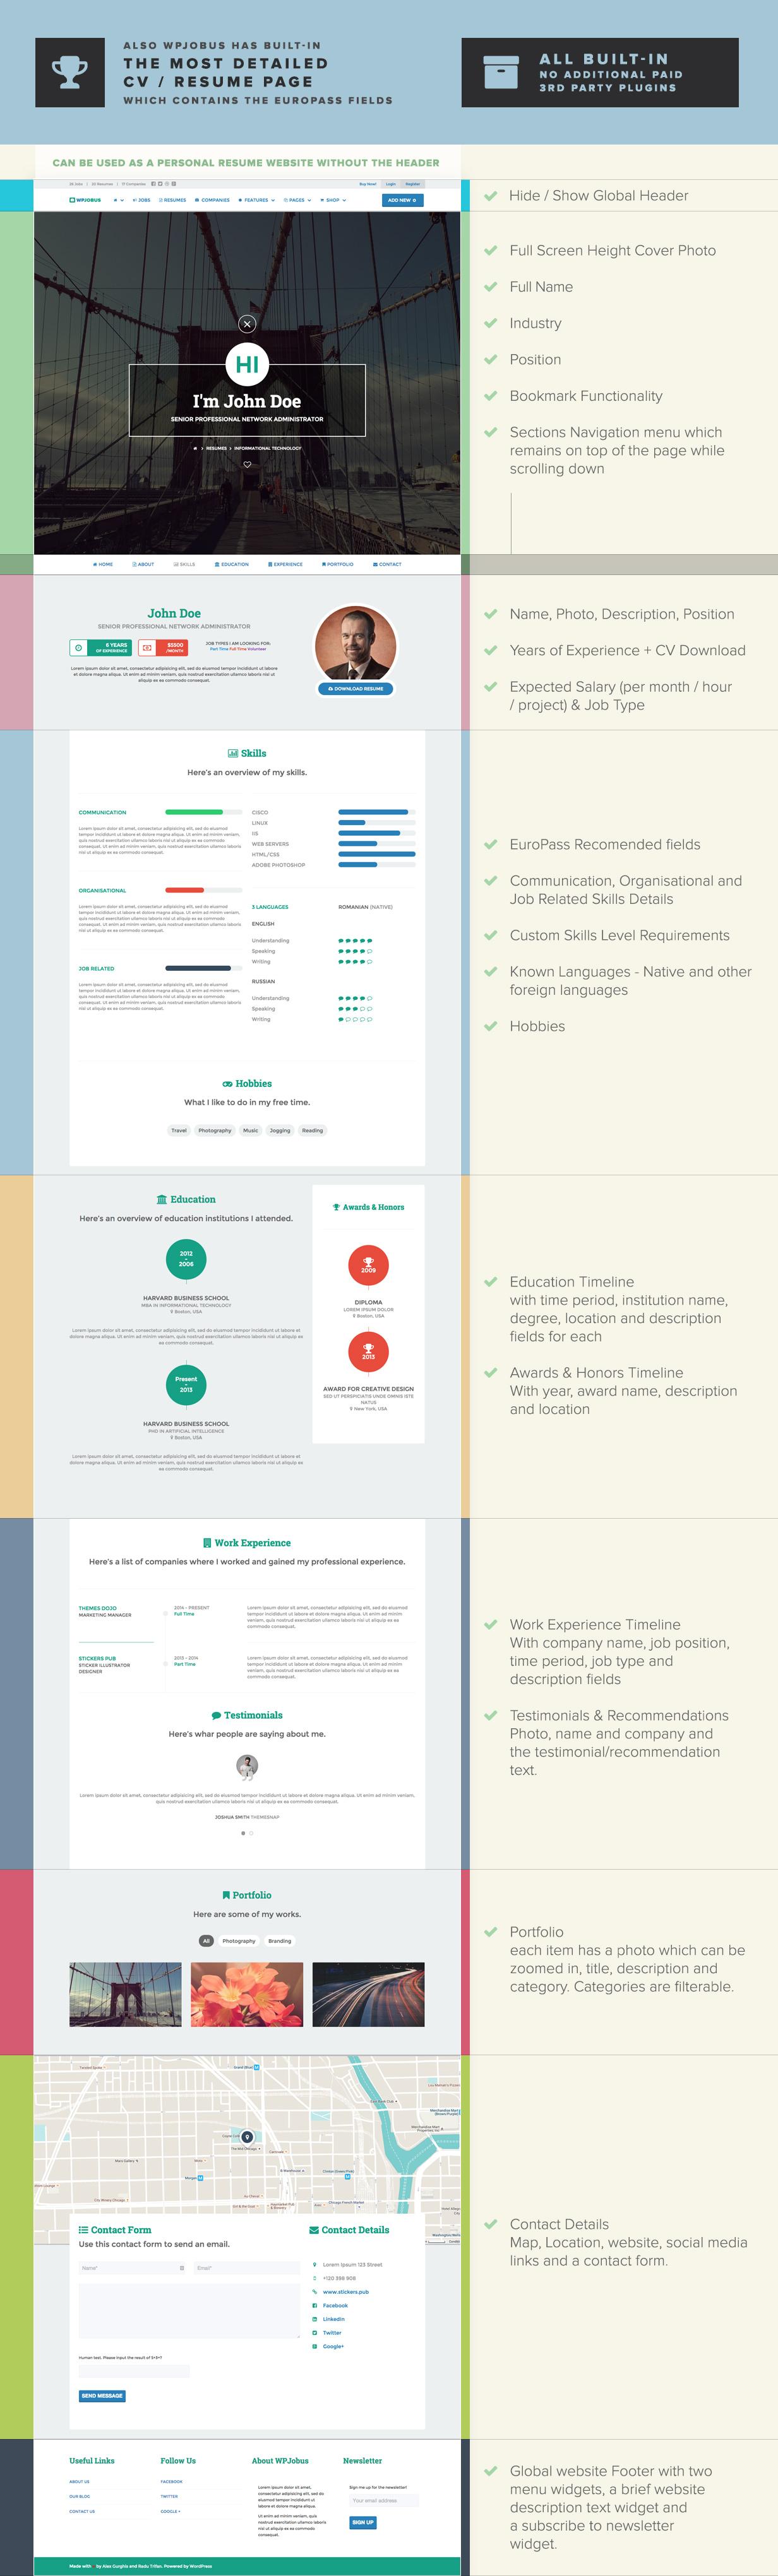 WPJobus - لوحة الوظائف والسير الذاتية لموضوع WordPress - 8